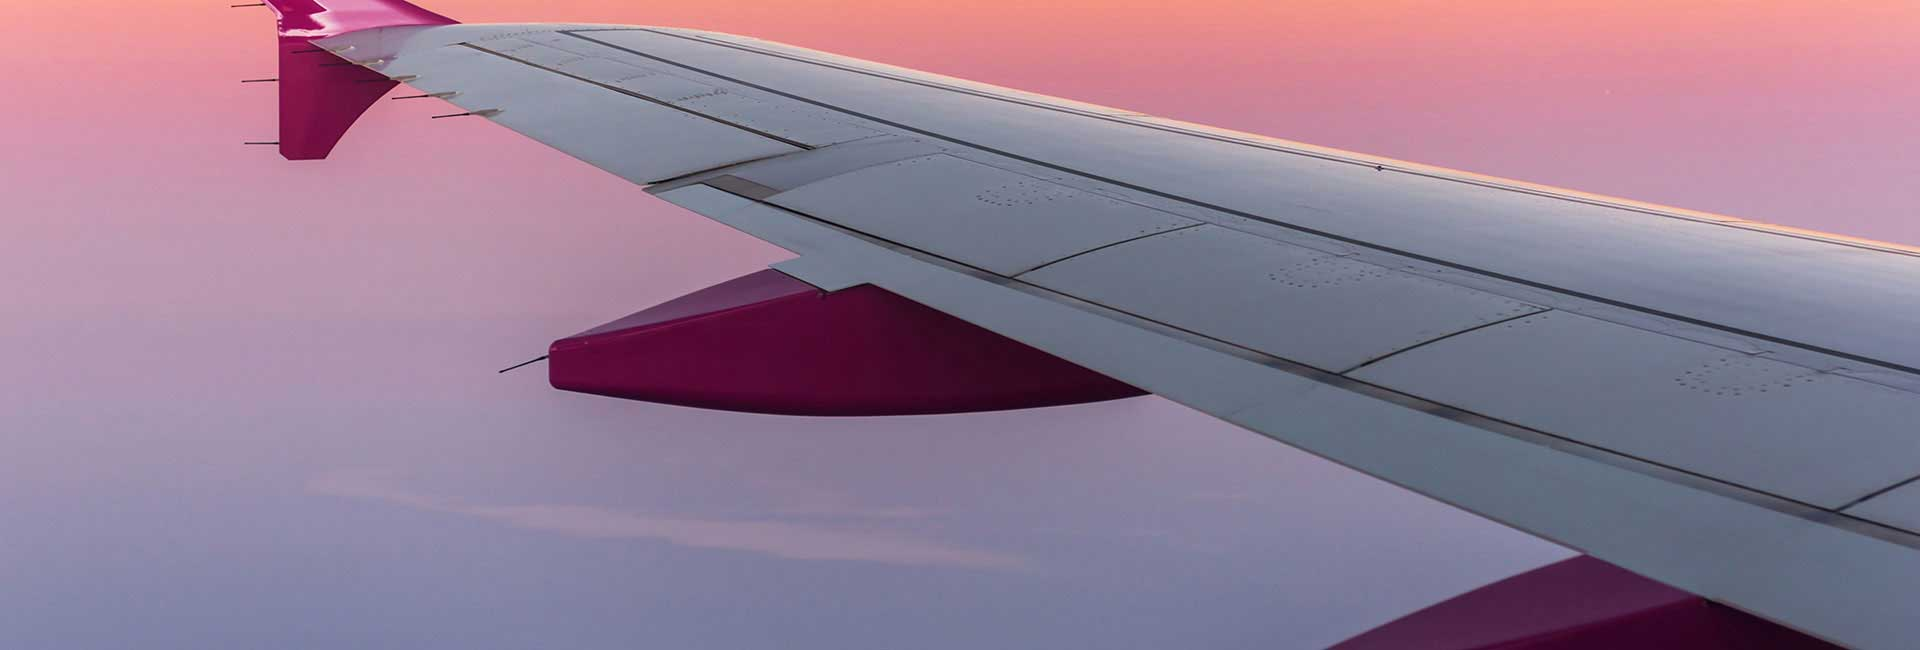 bilete avion agentie turism brasov